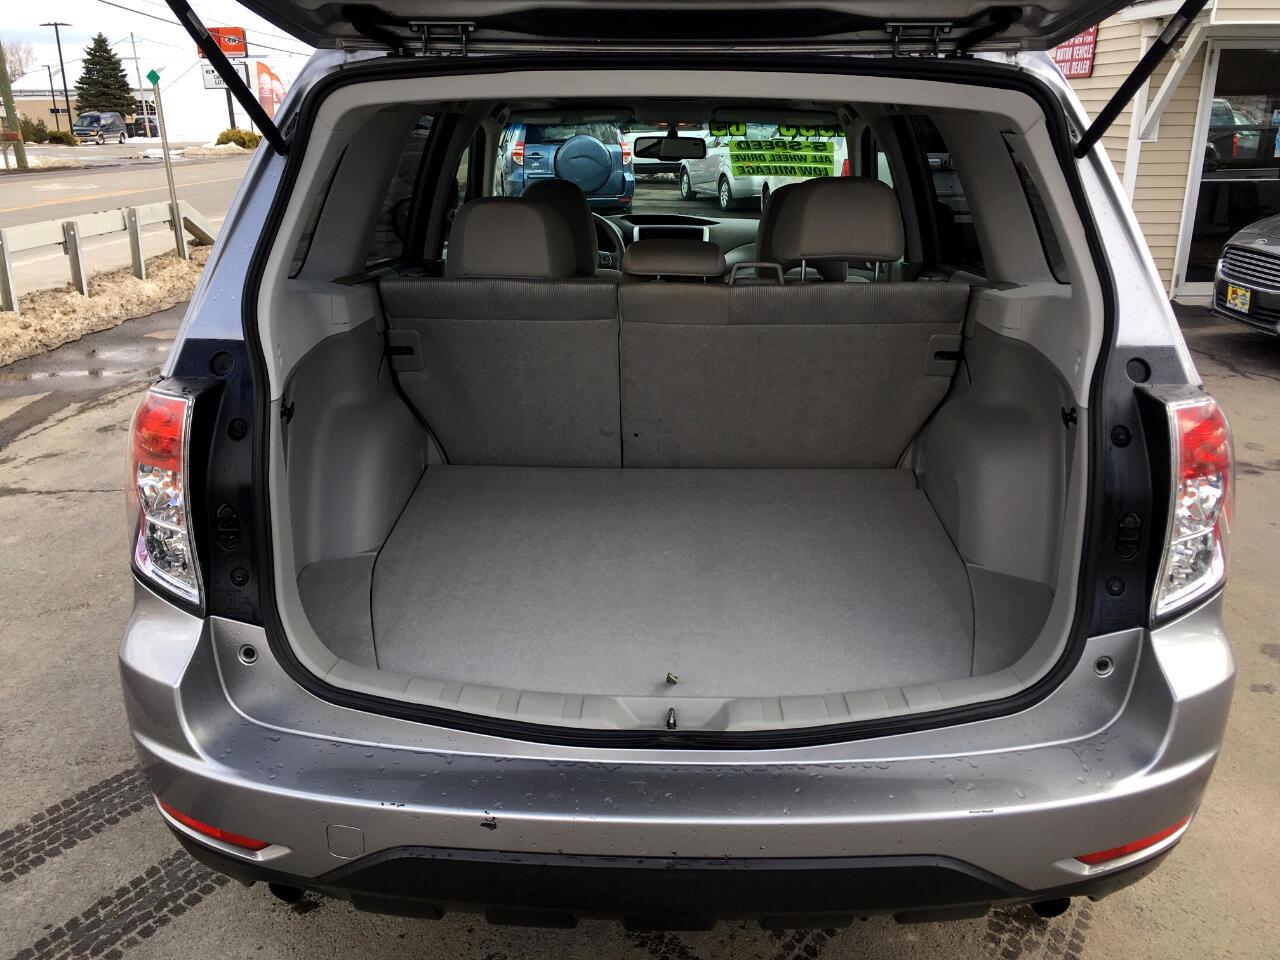 Subaru Forester (Natl) 4dr Man X w/Prem/All-Weather 2009